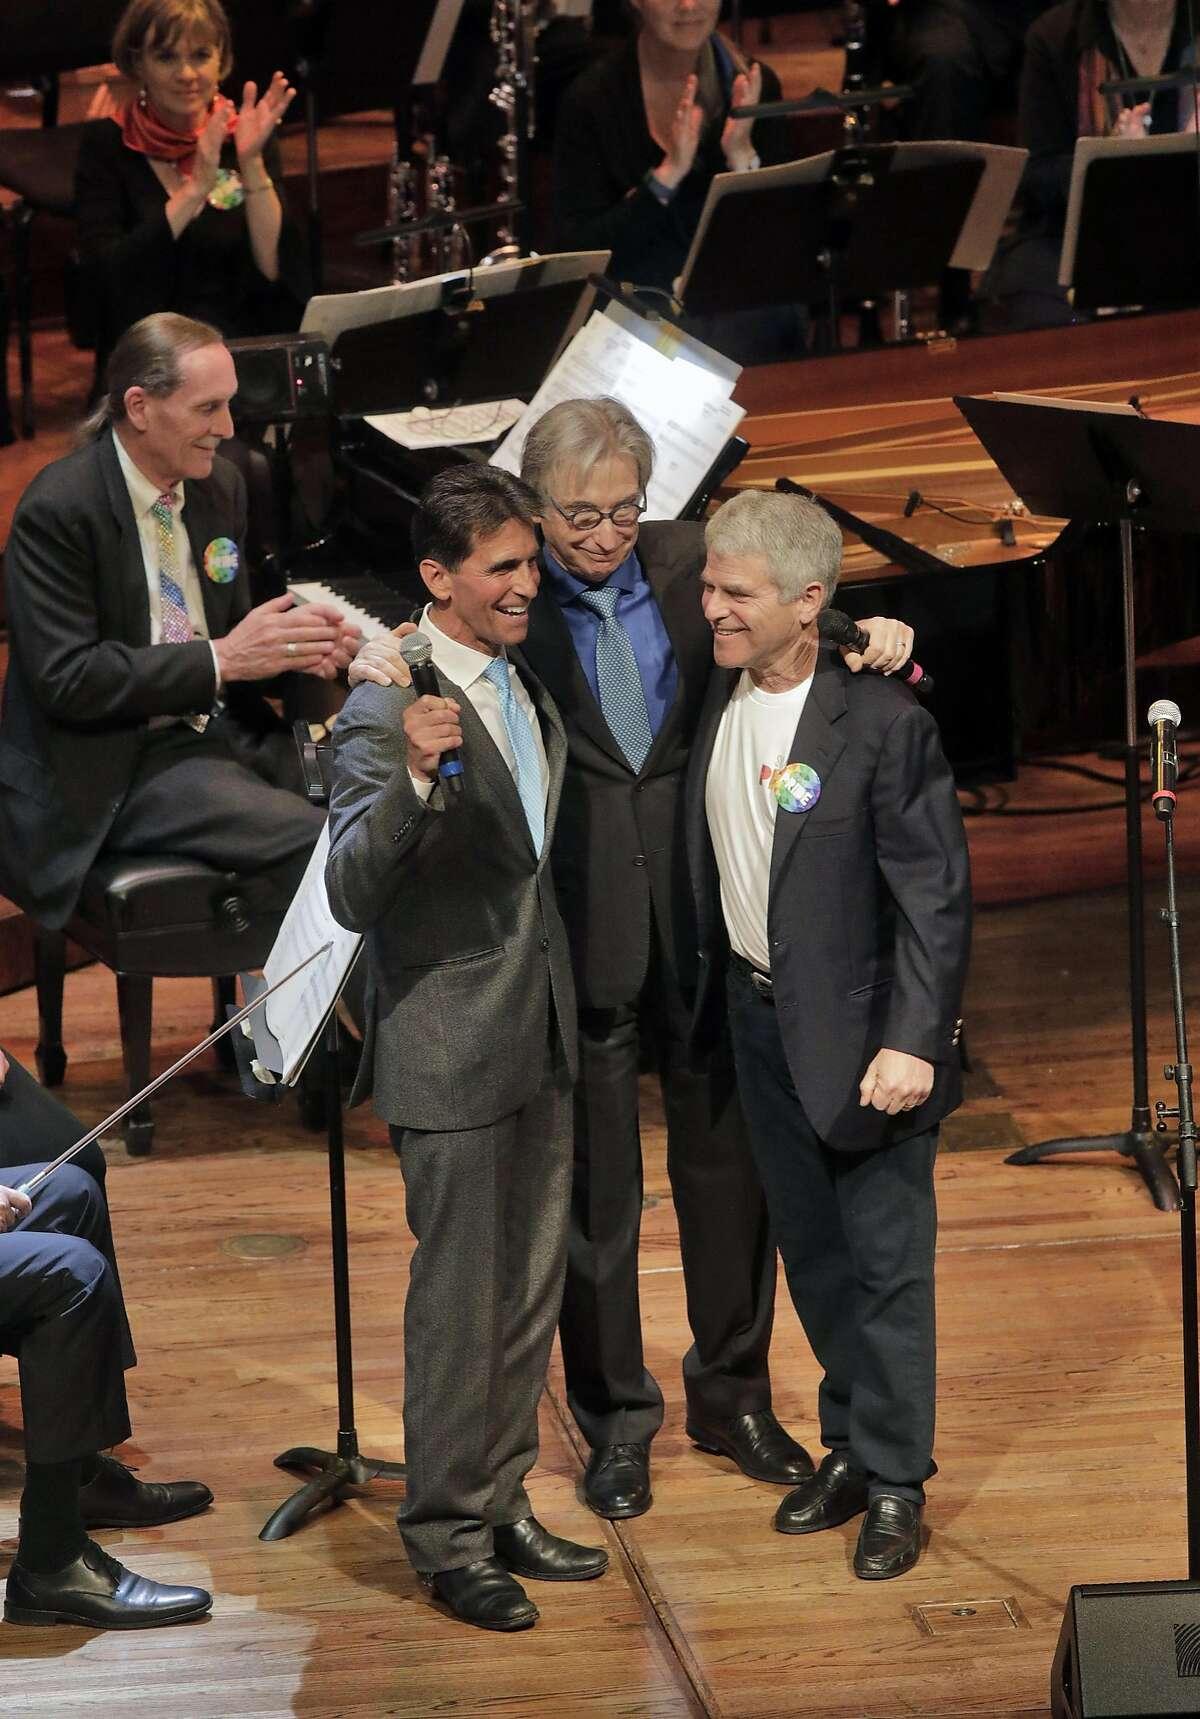 Mark Leno, Michael Tilson Thomas and Joshua Robison on-stage at Symphony Pride